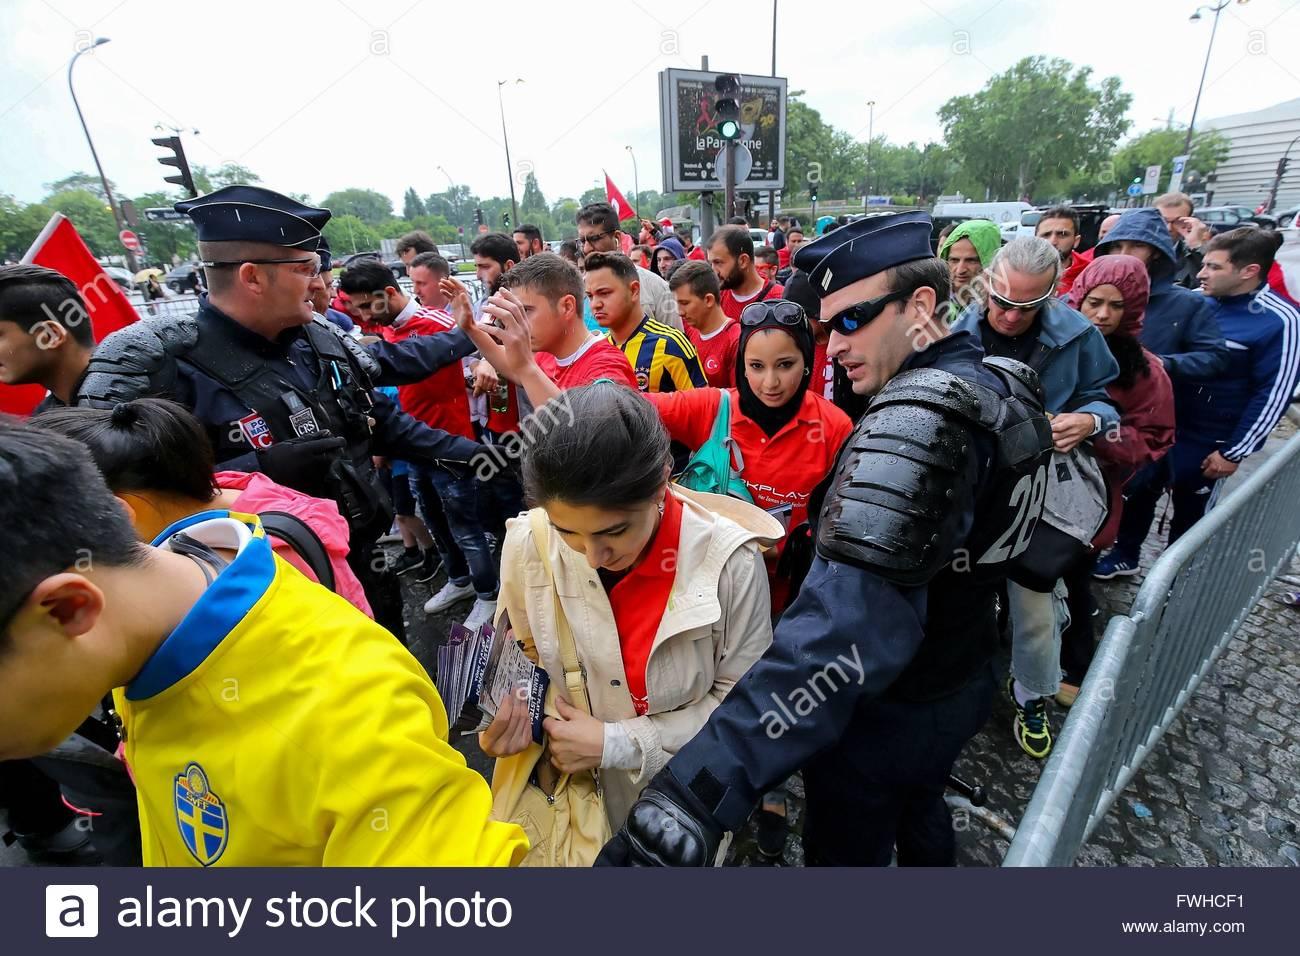 Paris,France. June 12nd, 2016. FRANCE, Paris: Police officers manage supporters at the entrance of Parc des Princes - Stock Image